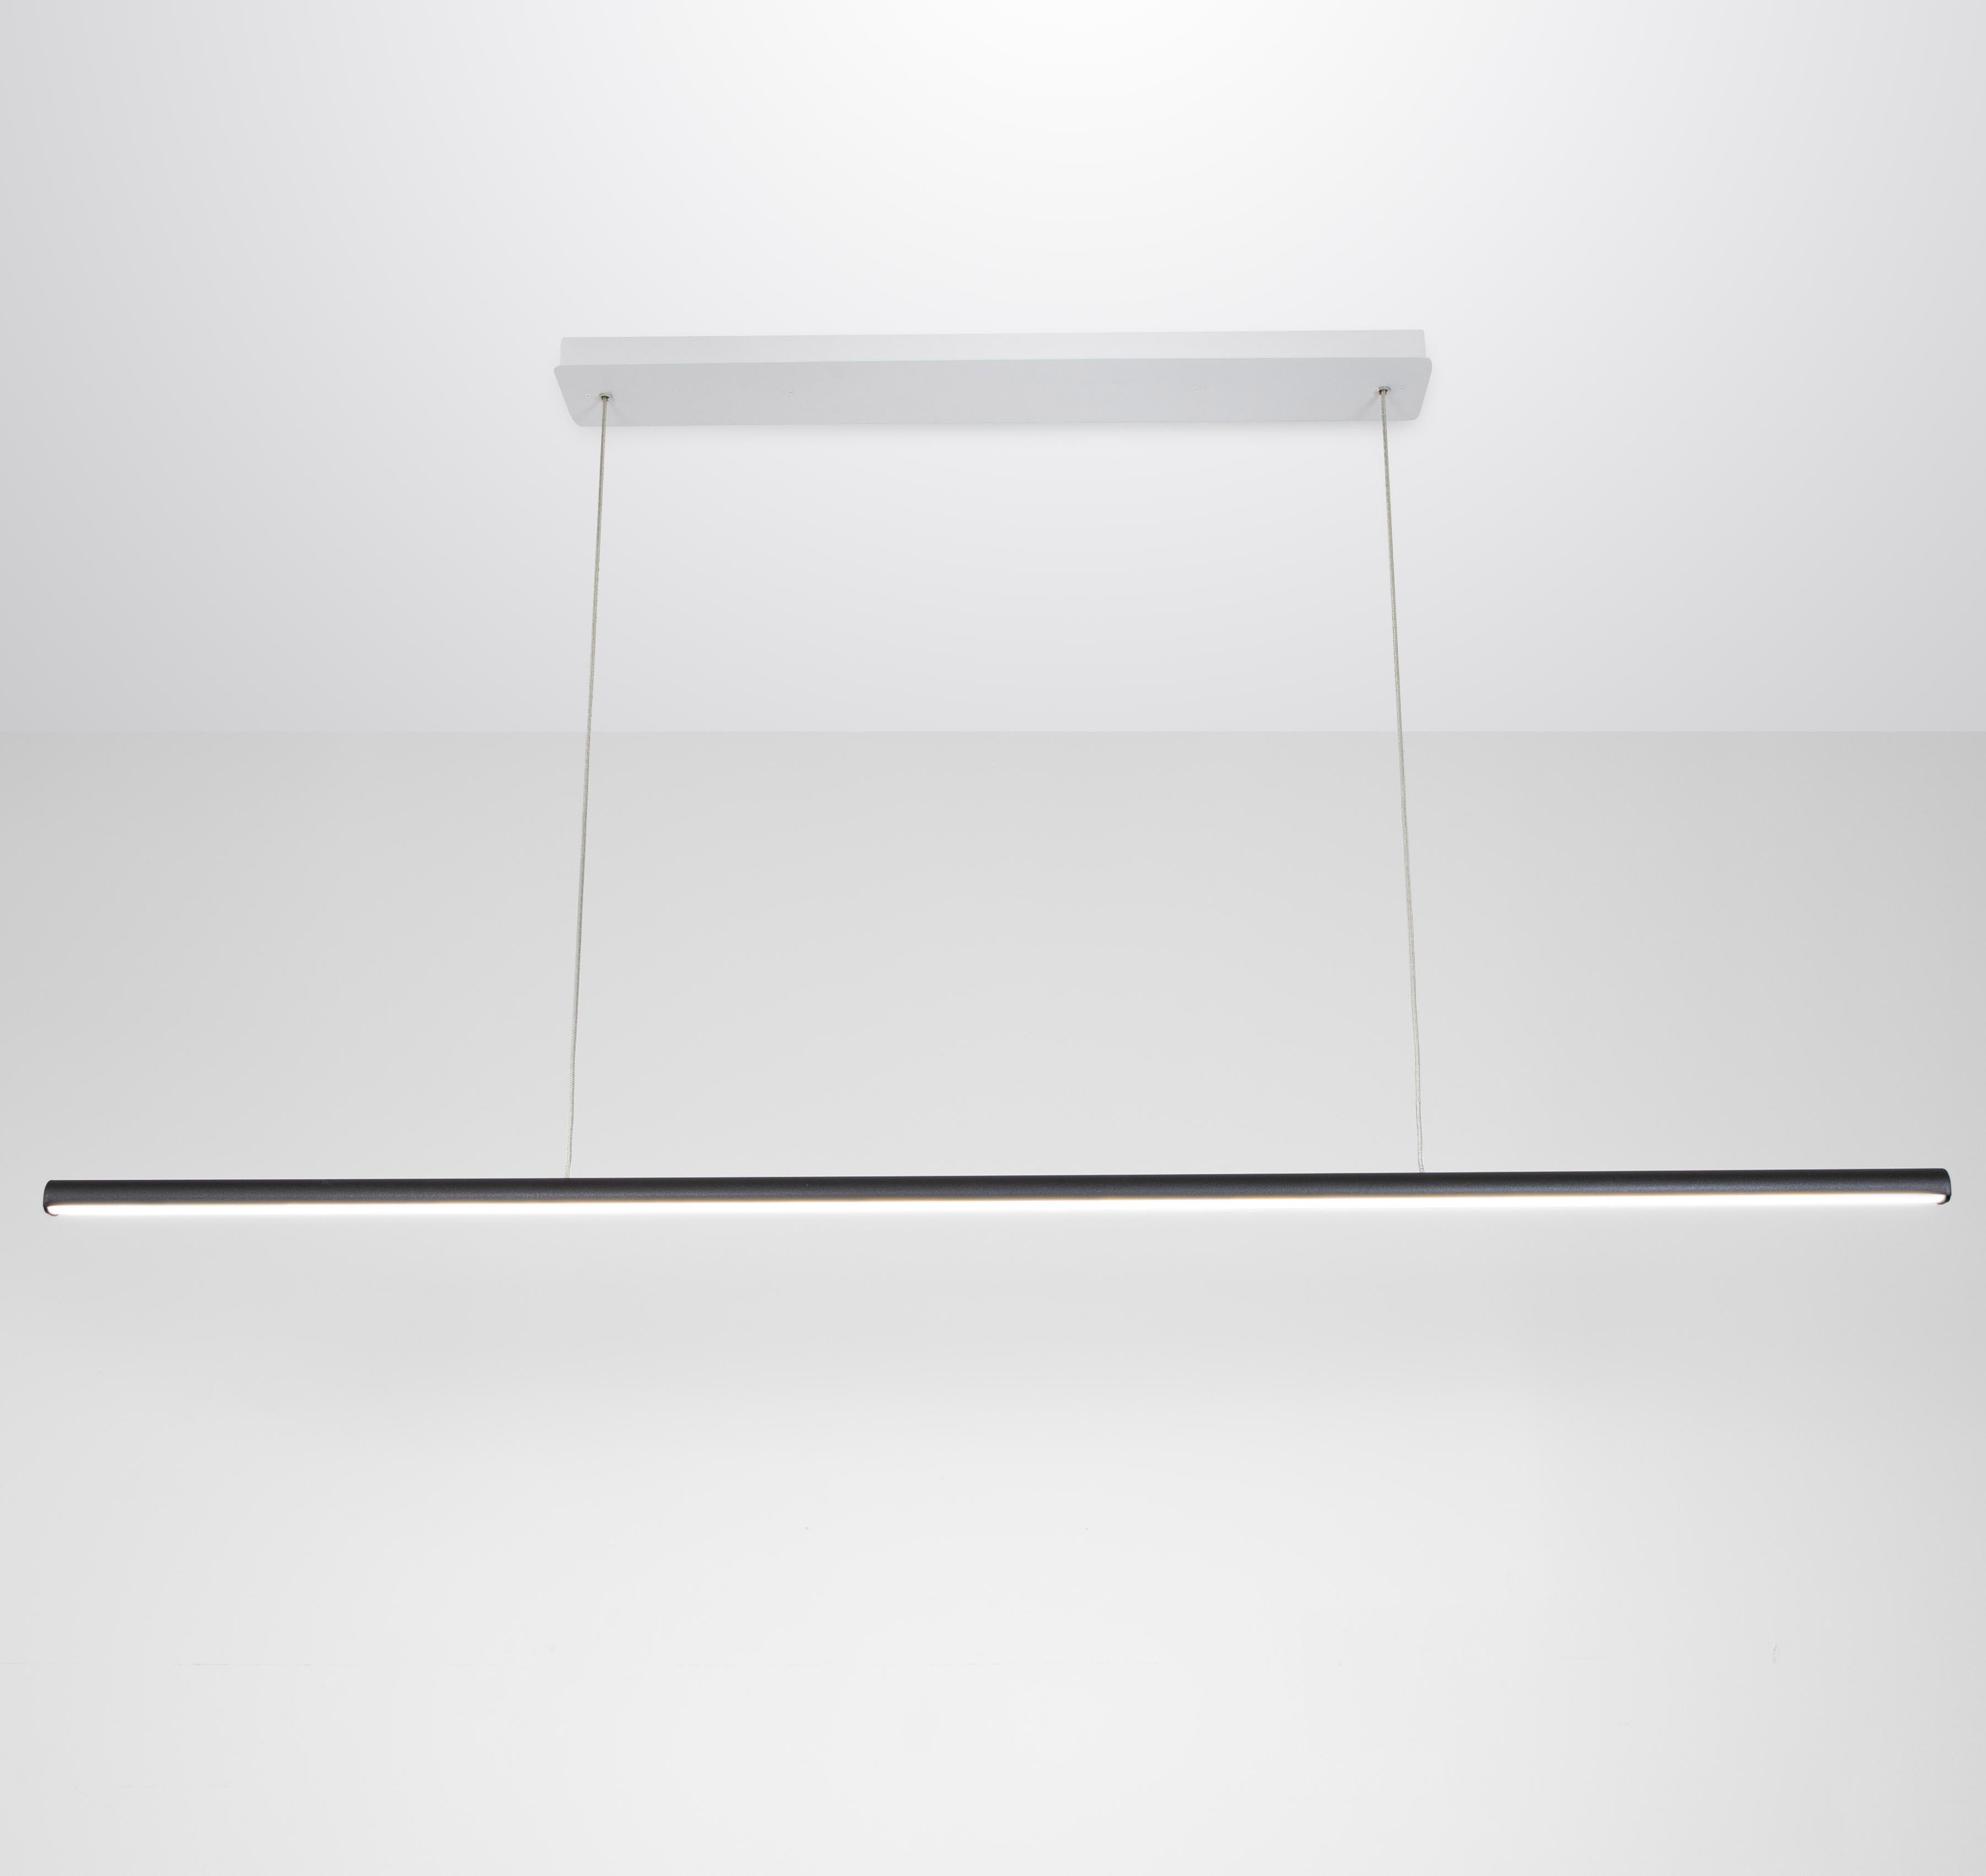 Rae LED linear pendant lighting